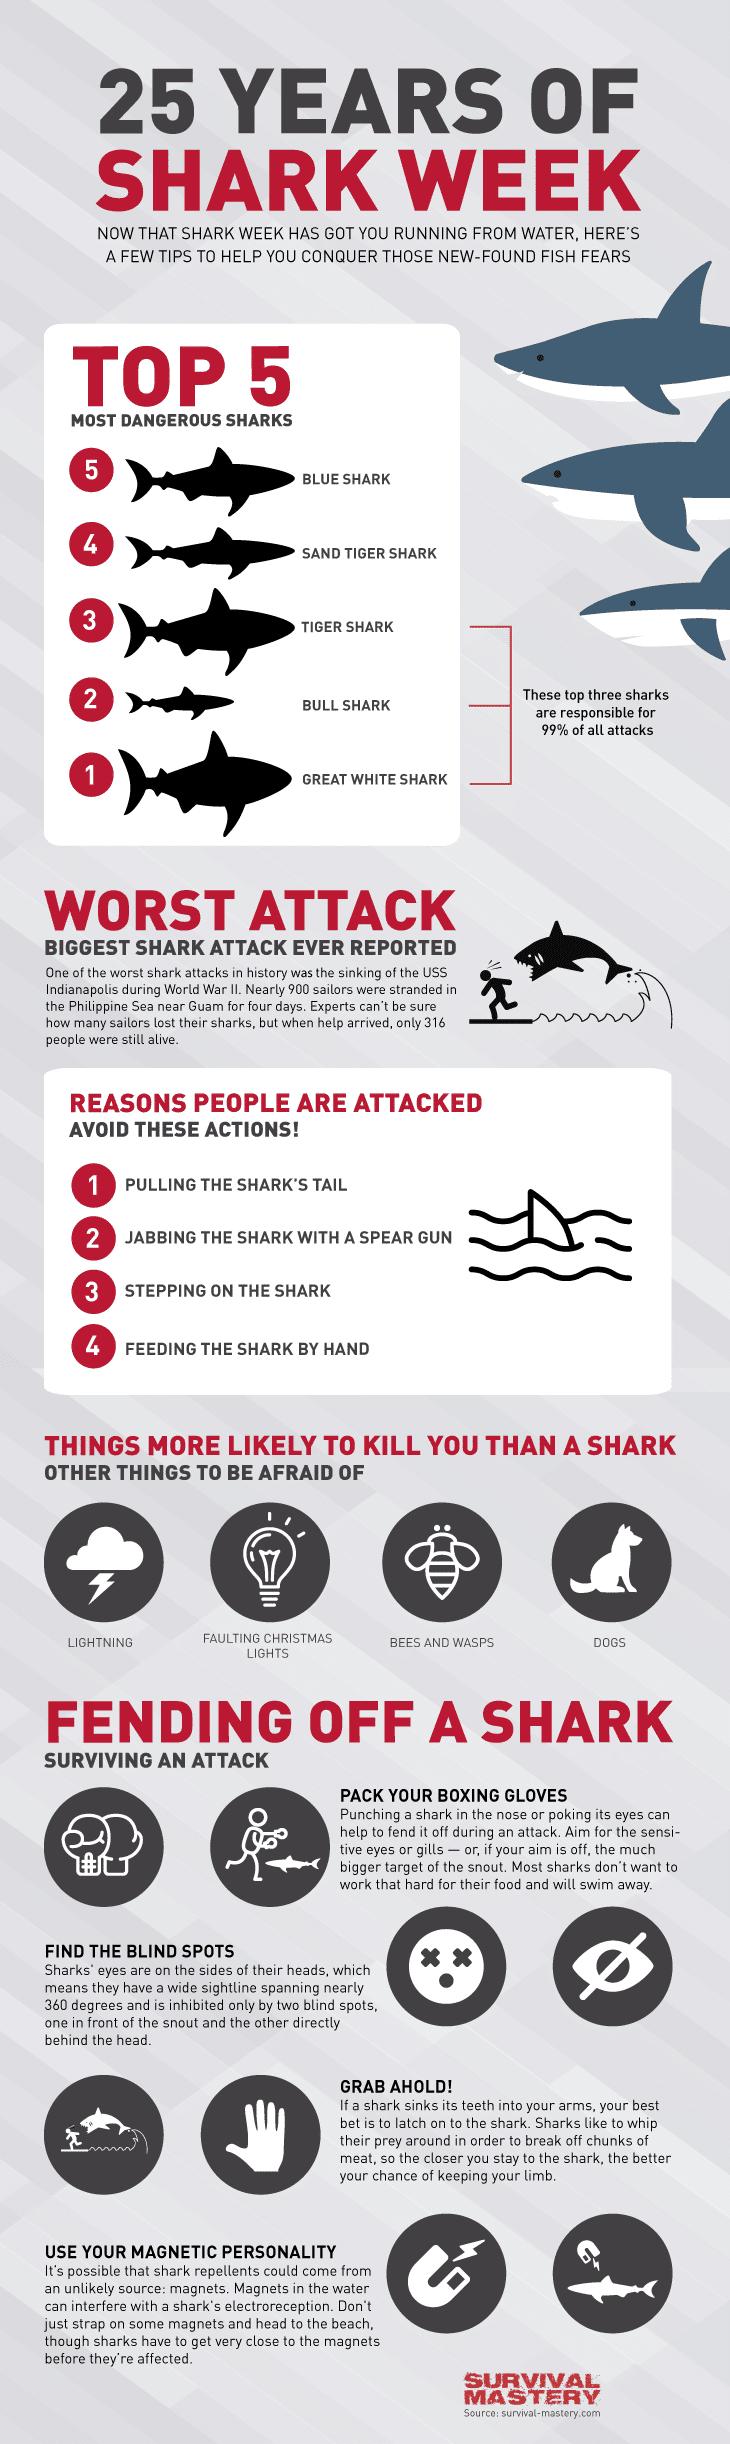 Shark week infographic